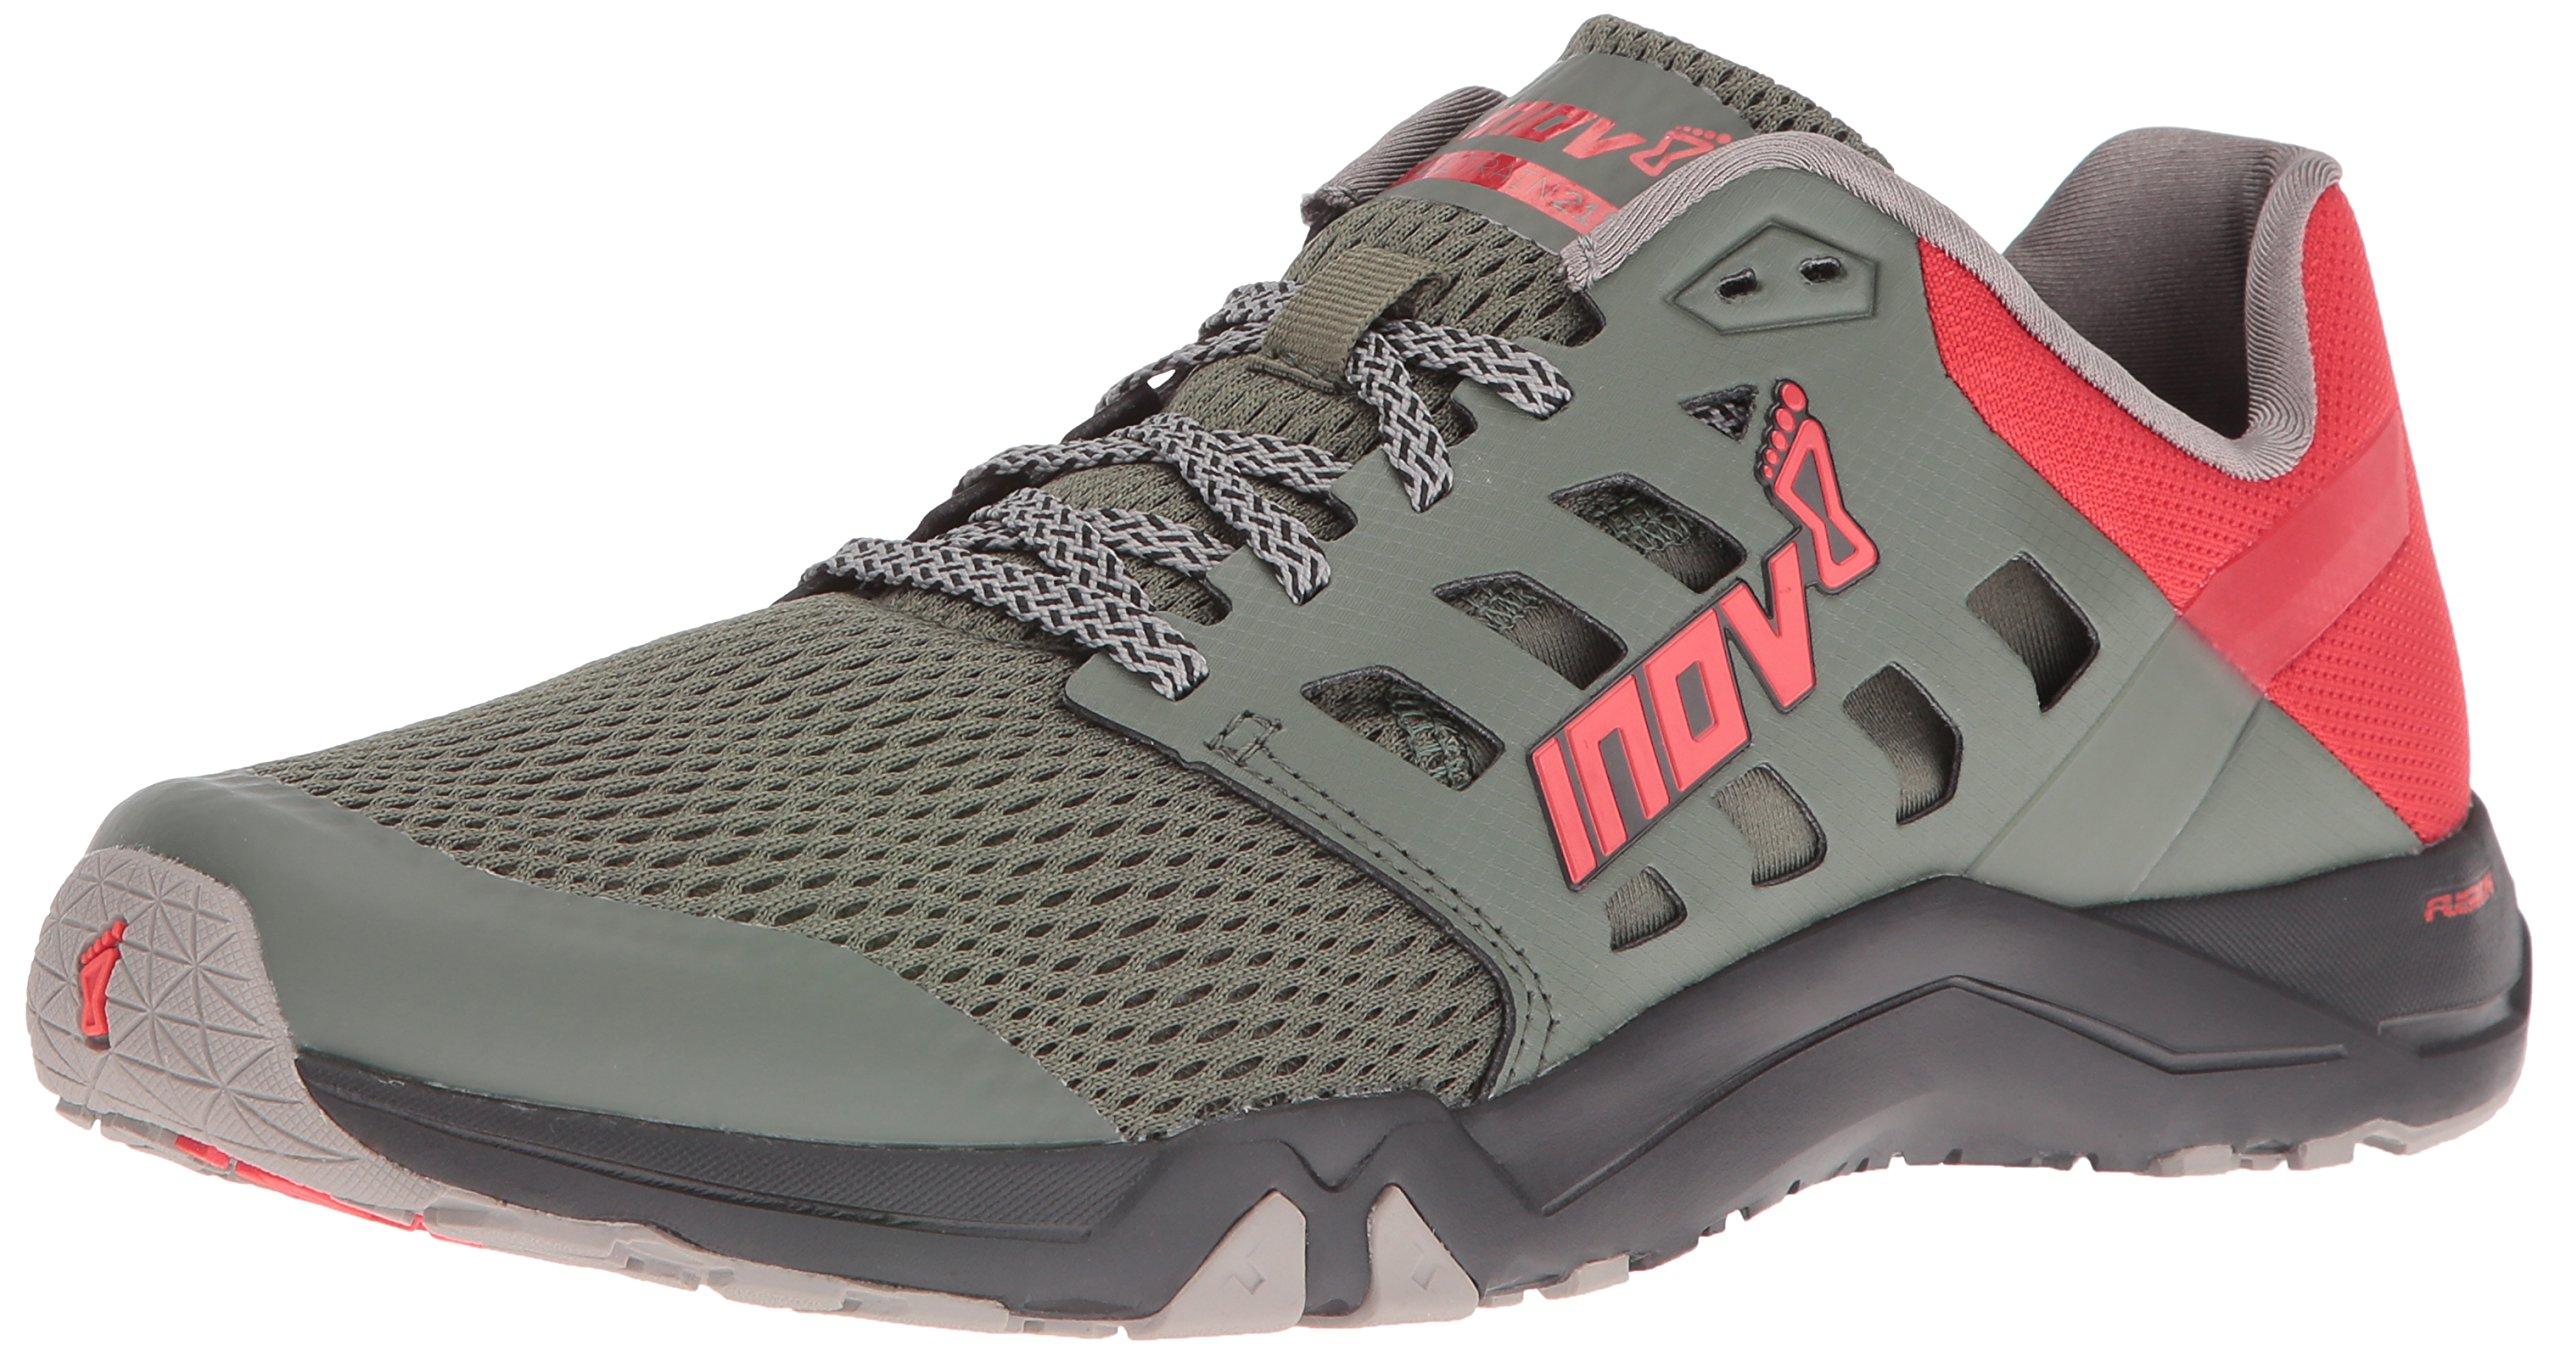 Inov-8 Men's All Train 215 Cross-Trainer Shoe, Dark Green/Red/Black, 12 D US by Inov-8 (Image #1)